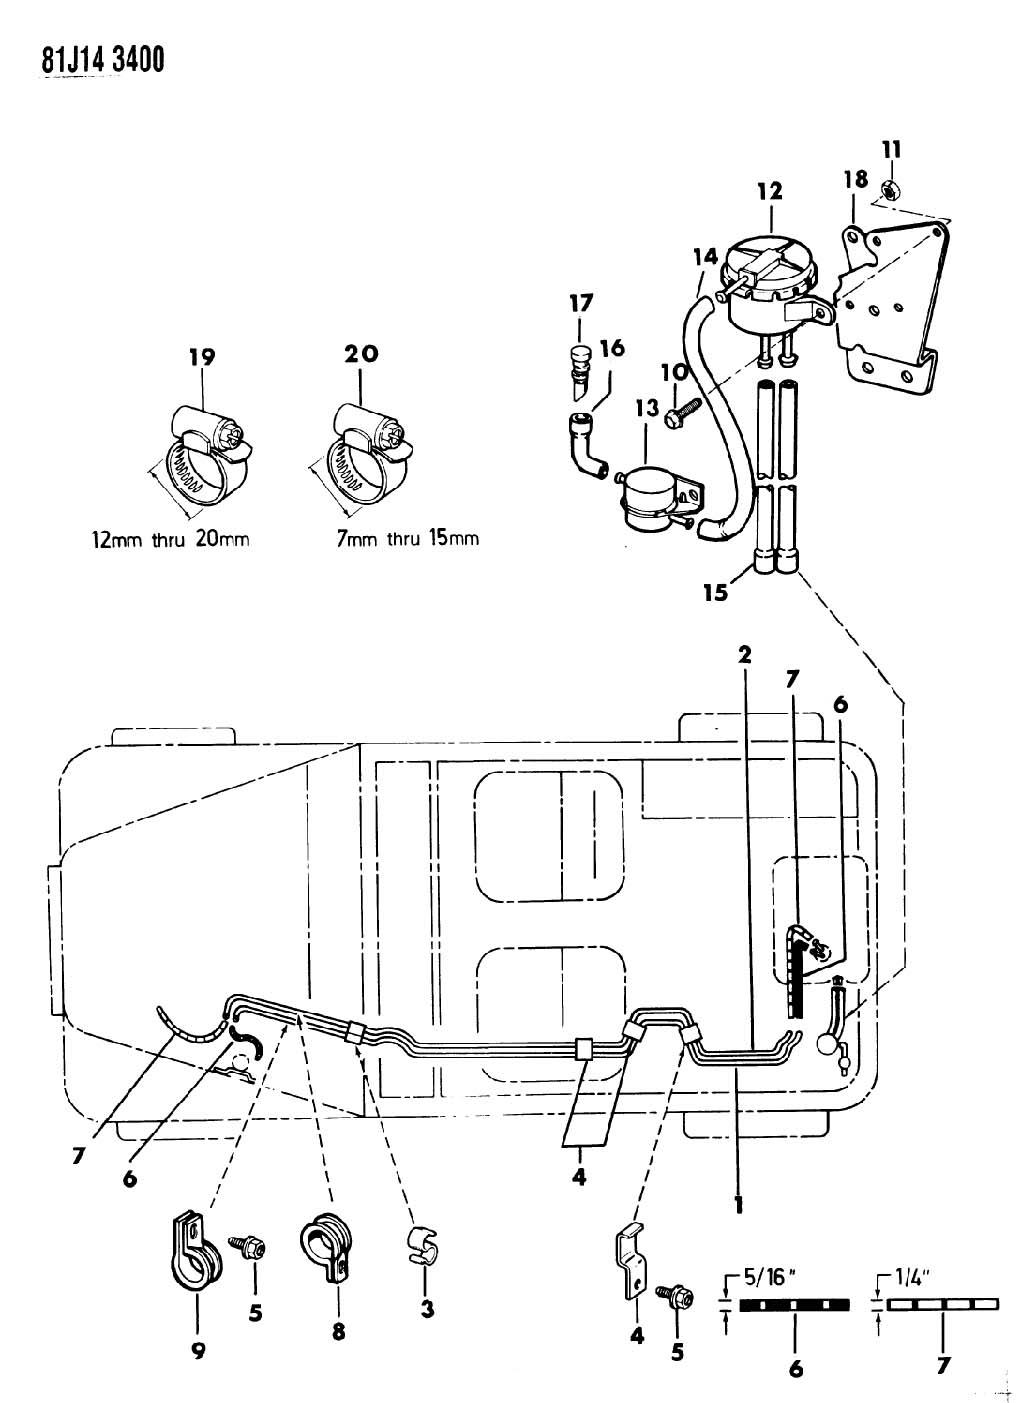 [DIAGRAM] Jeep Cj Fuel Line Diagram FULL Version HD